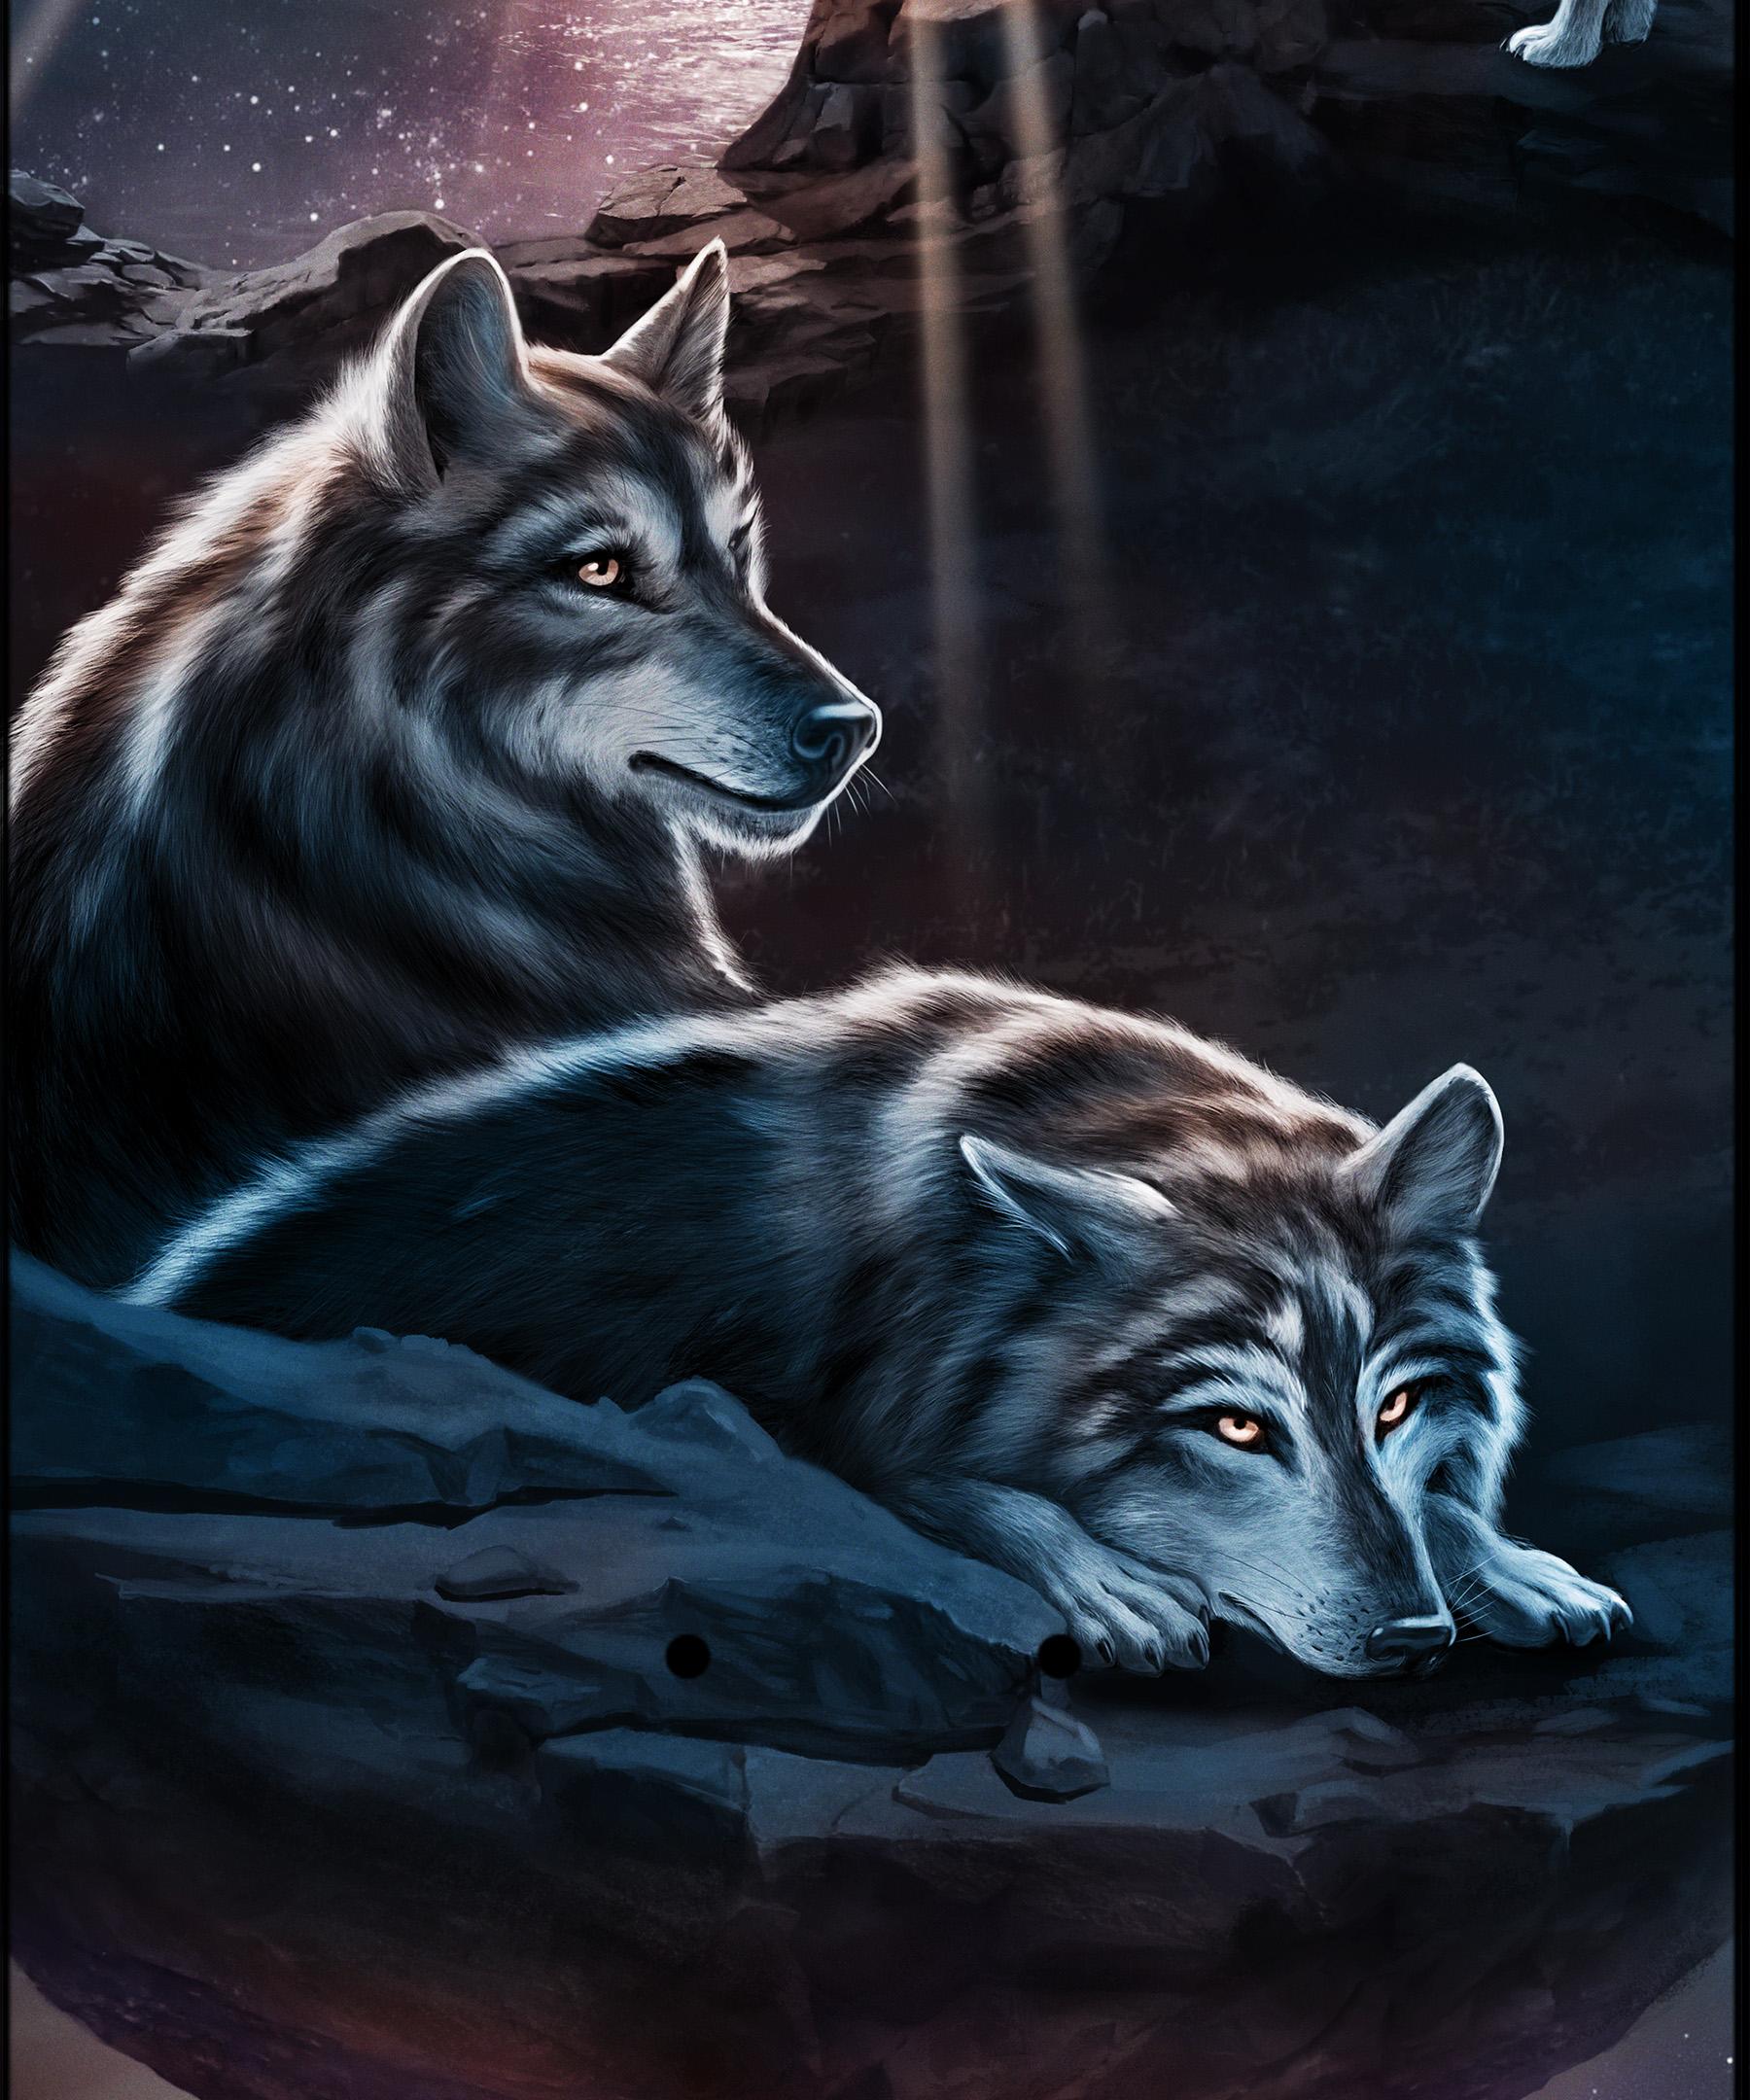 patrickgraf_sevevonow_wolfboard_04.jpg